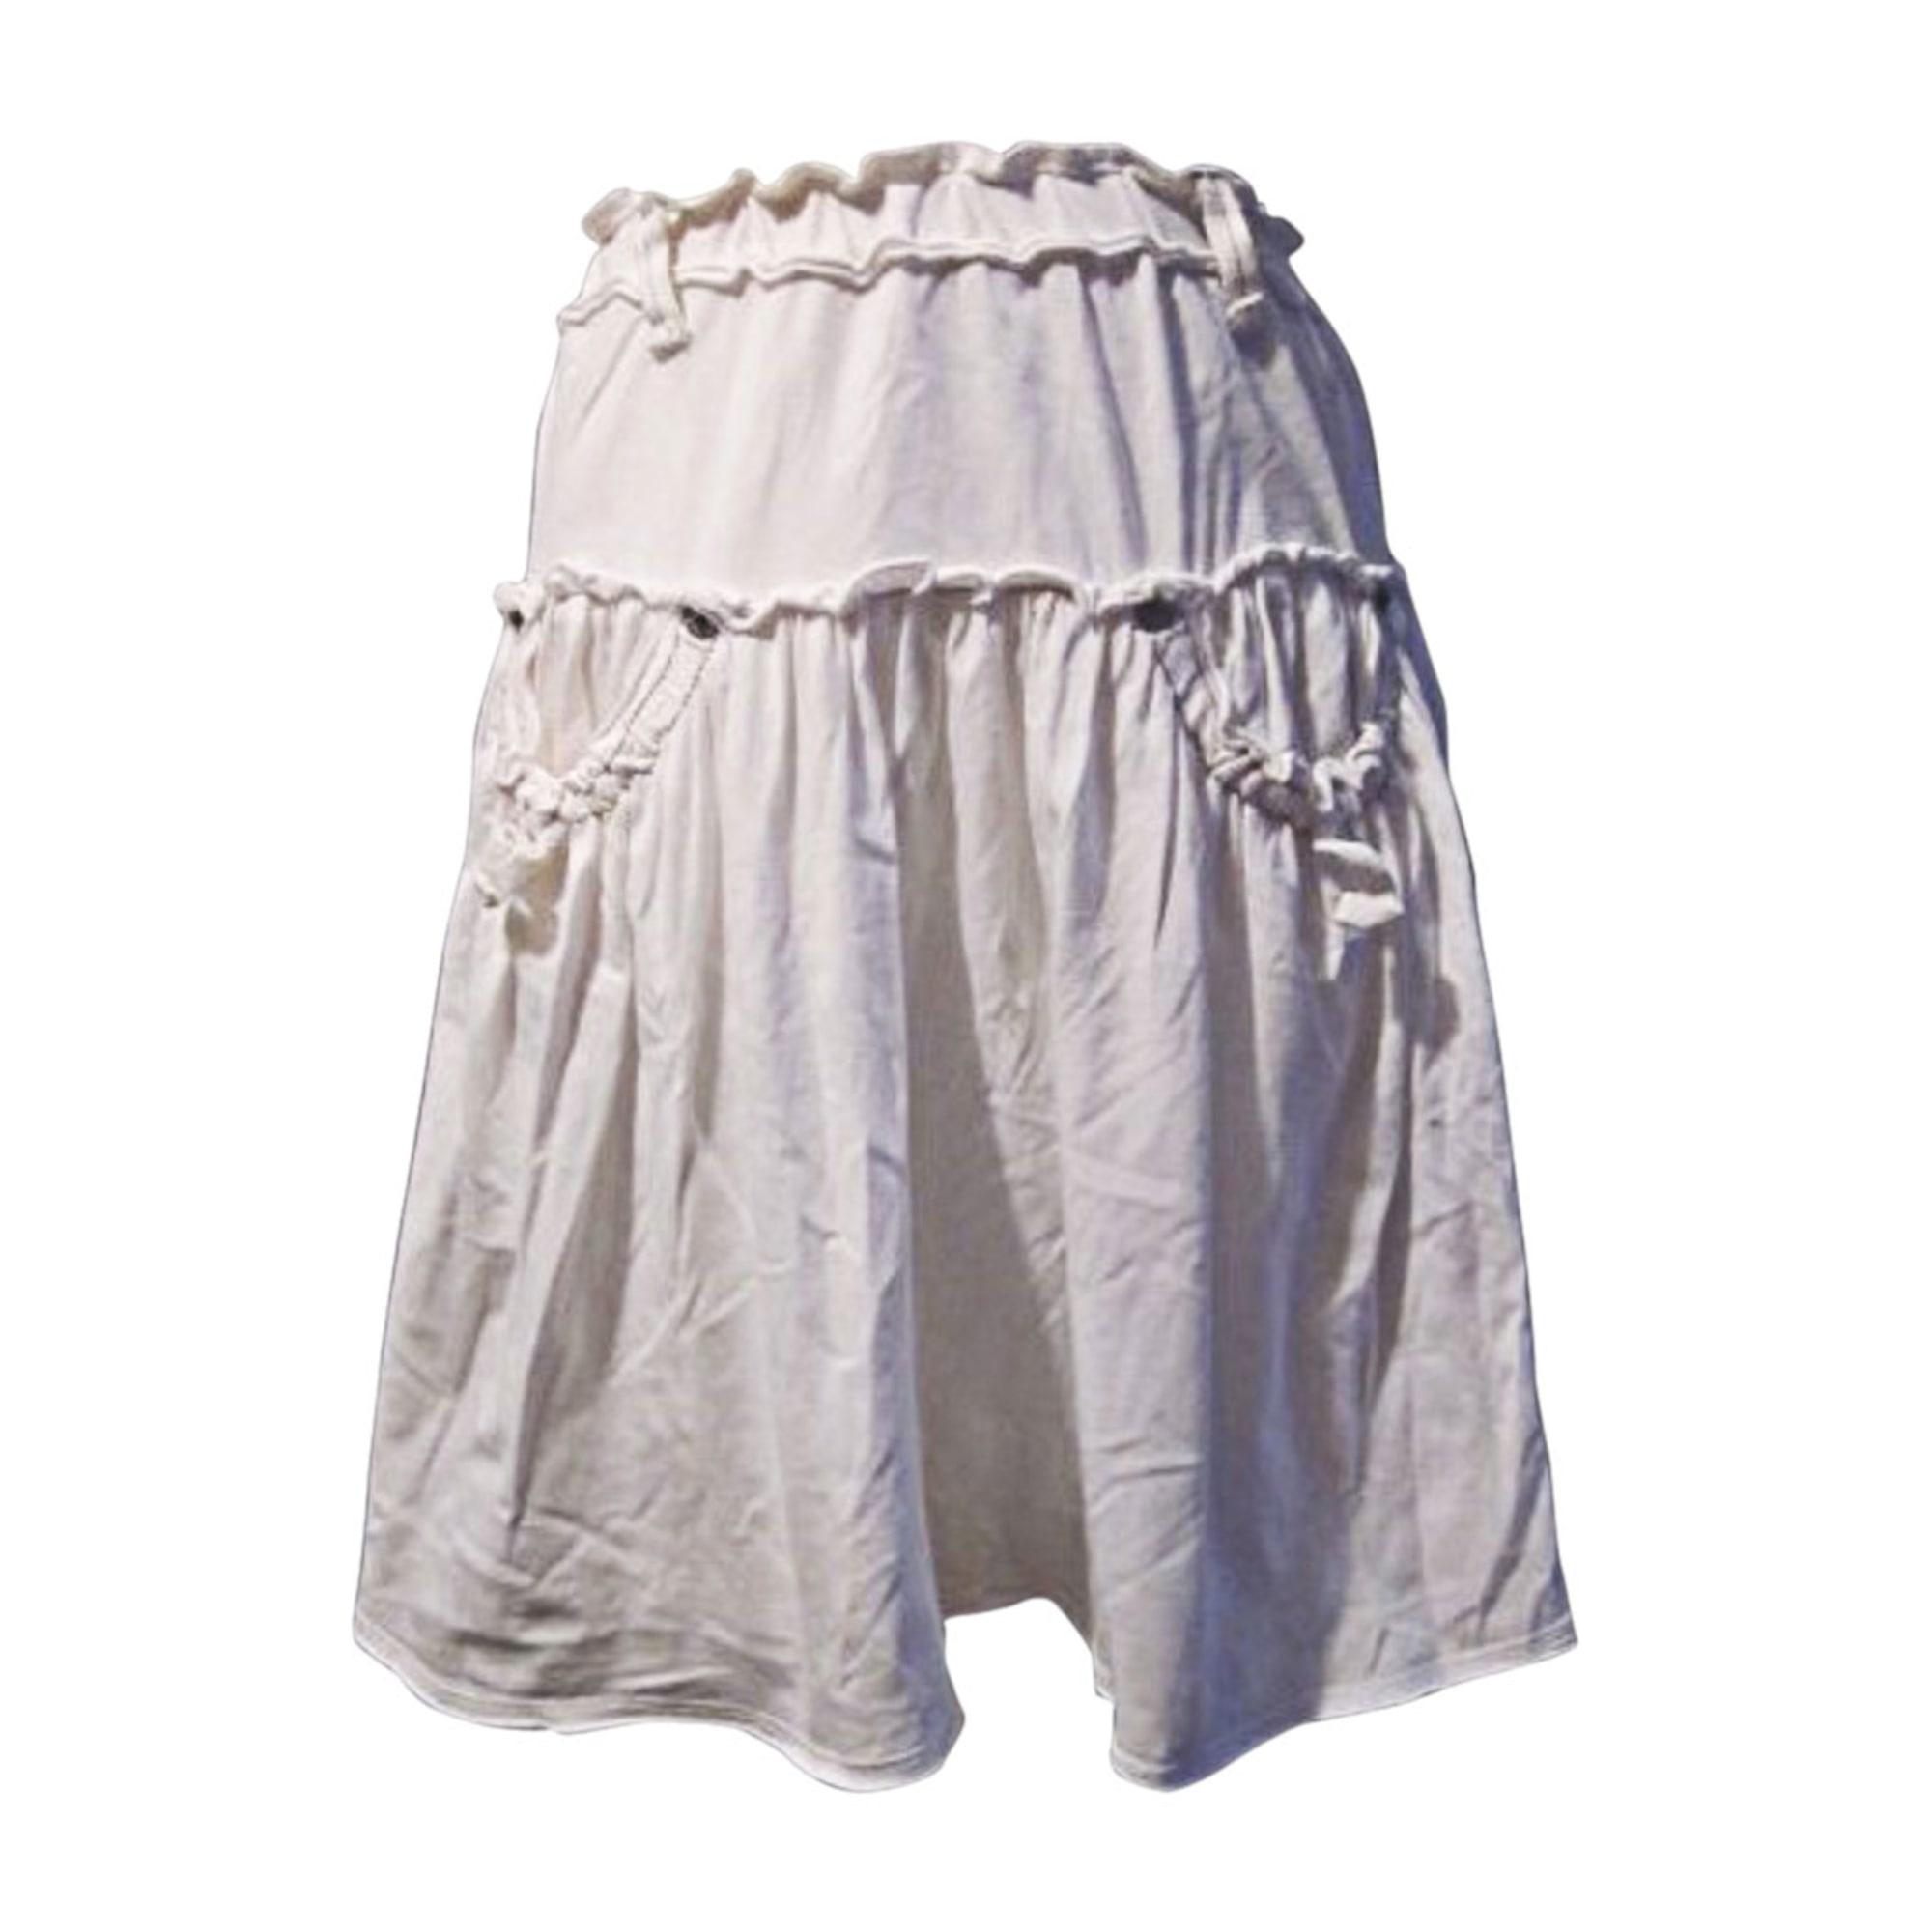 Jupe DKNY Blanc, blanc cassé, écru